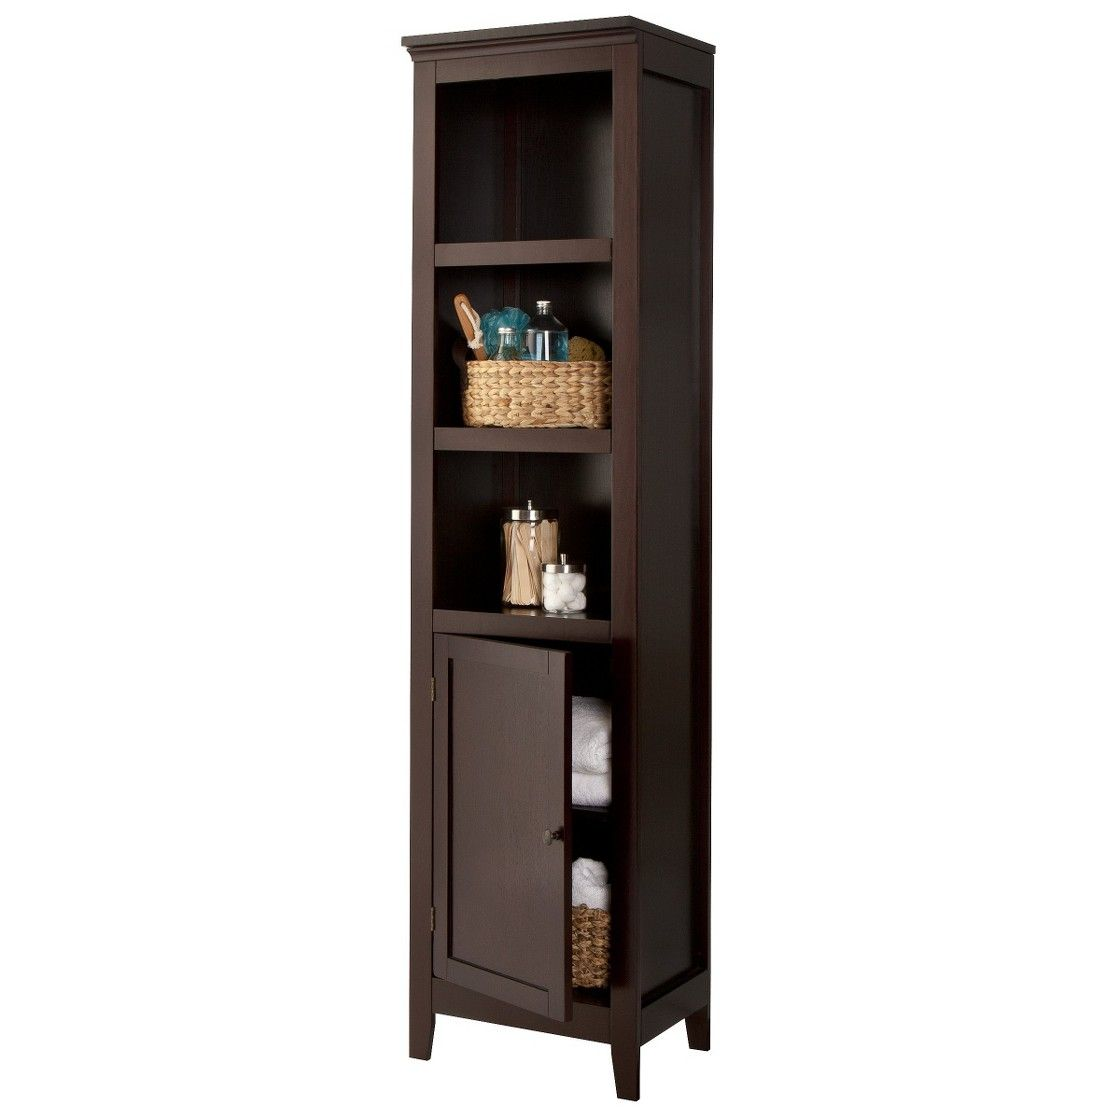 Threshold Carson Narrow Bookcase with Storage | Bookcase ...